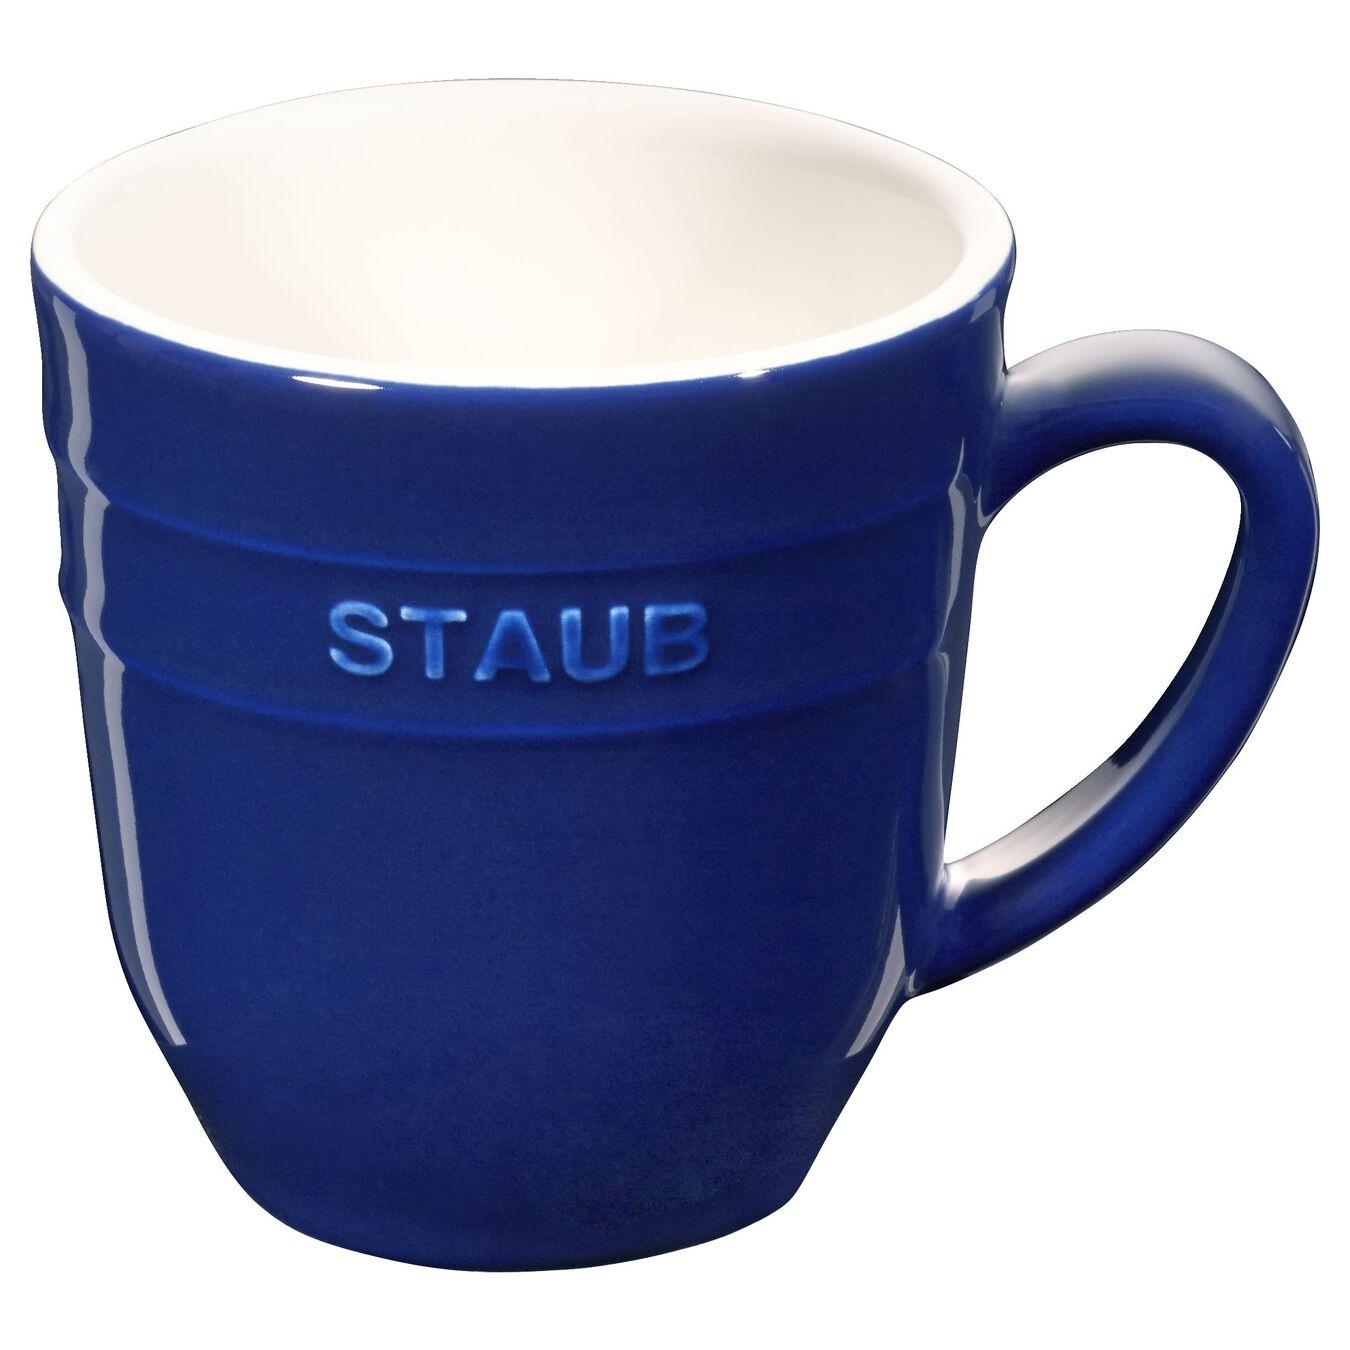 Mug 350 ml, Bleu intense, Céramique,,large 1